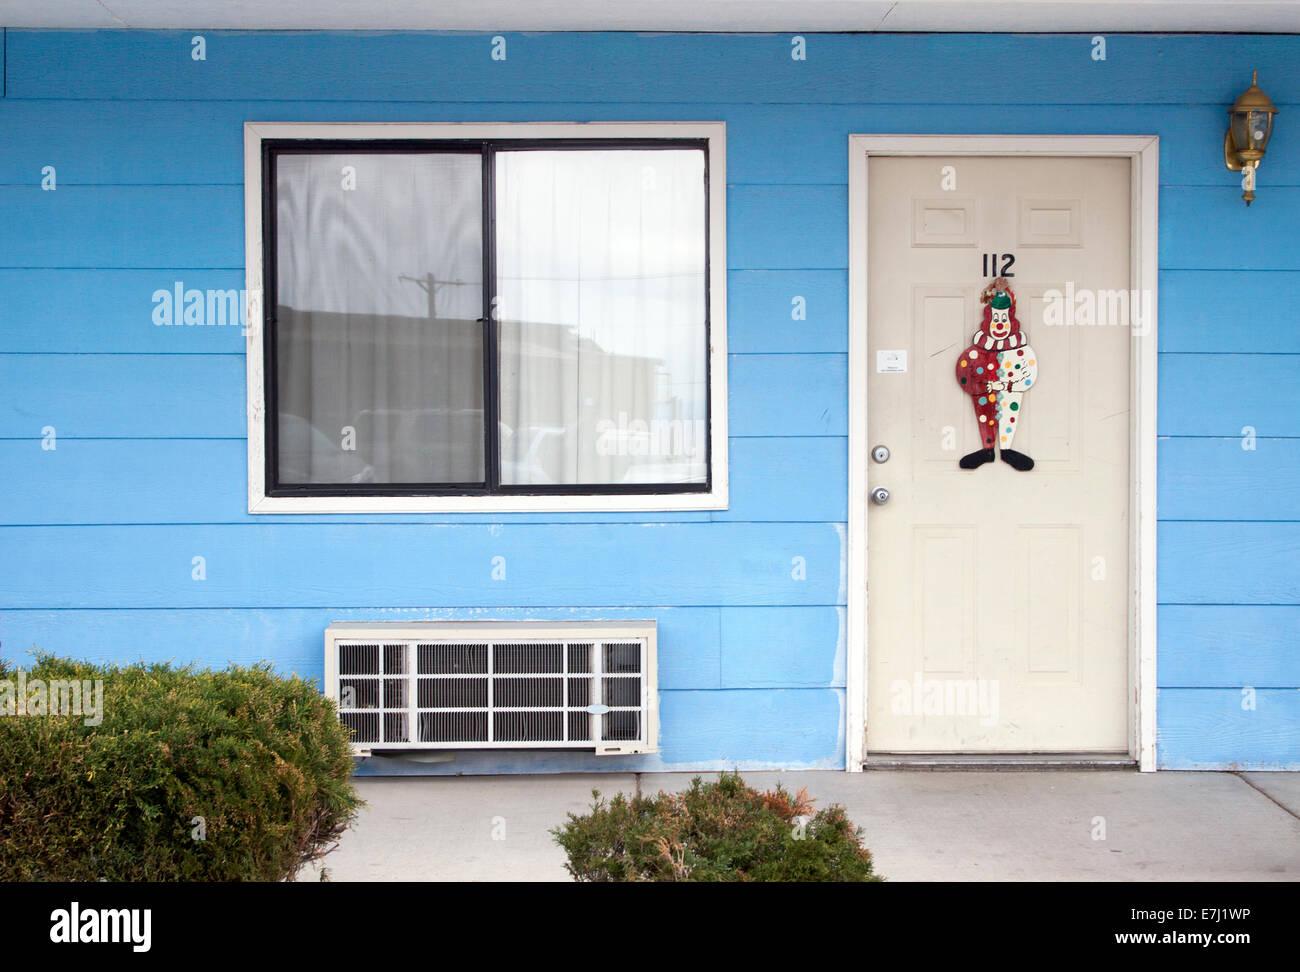 The Clown Motel in Tonopah Nevada - Stock Image